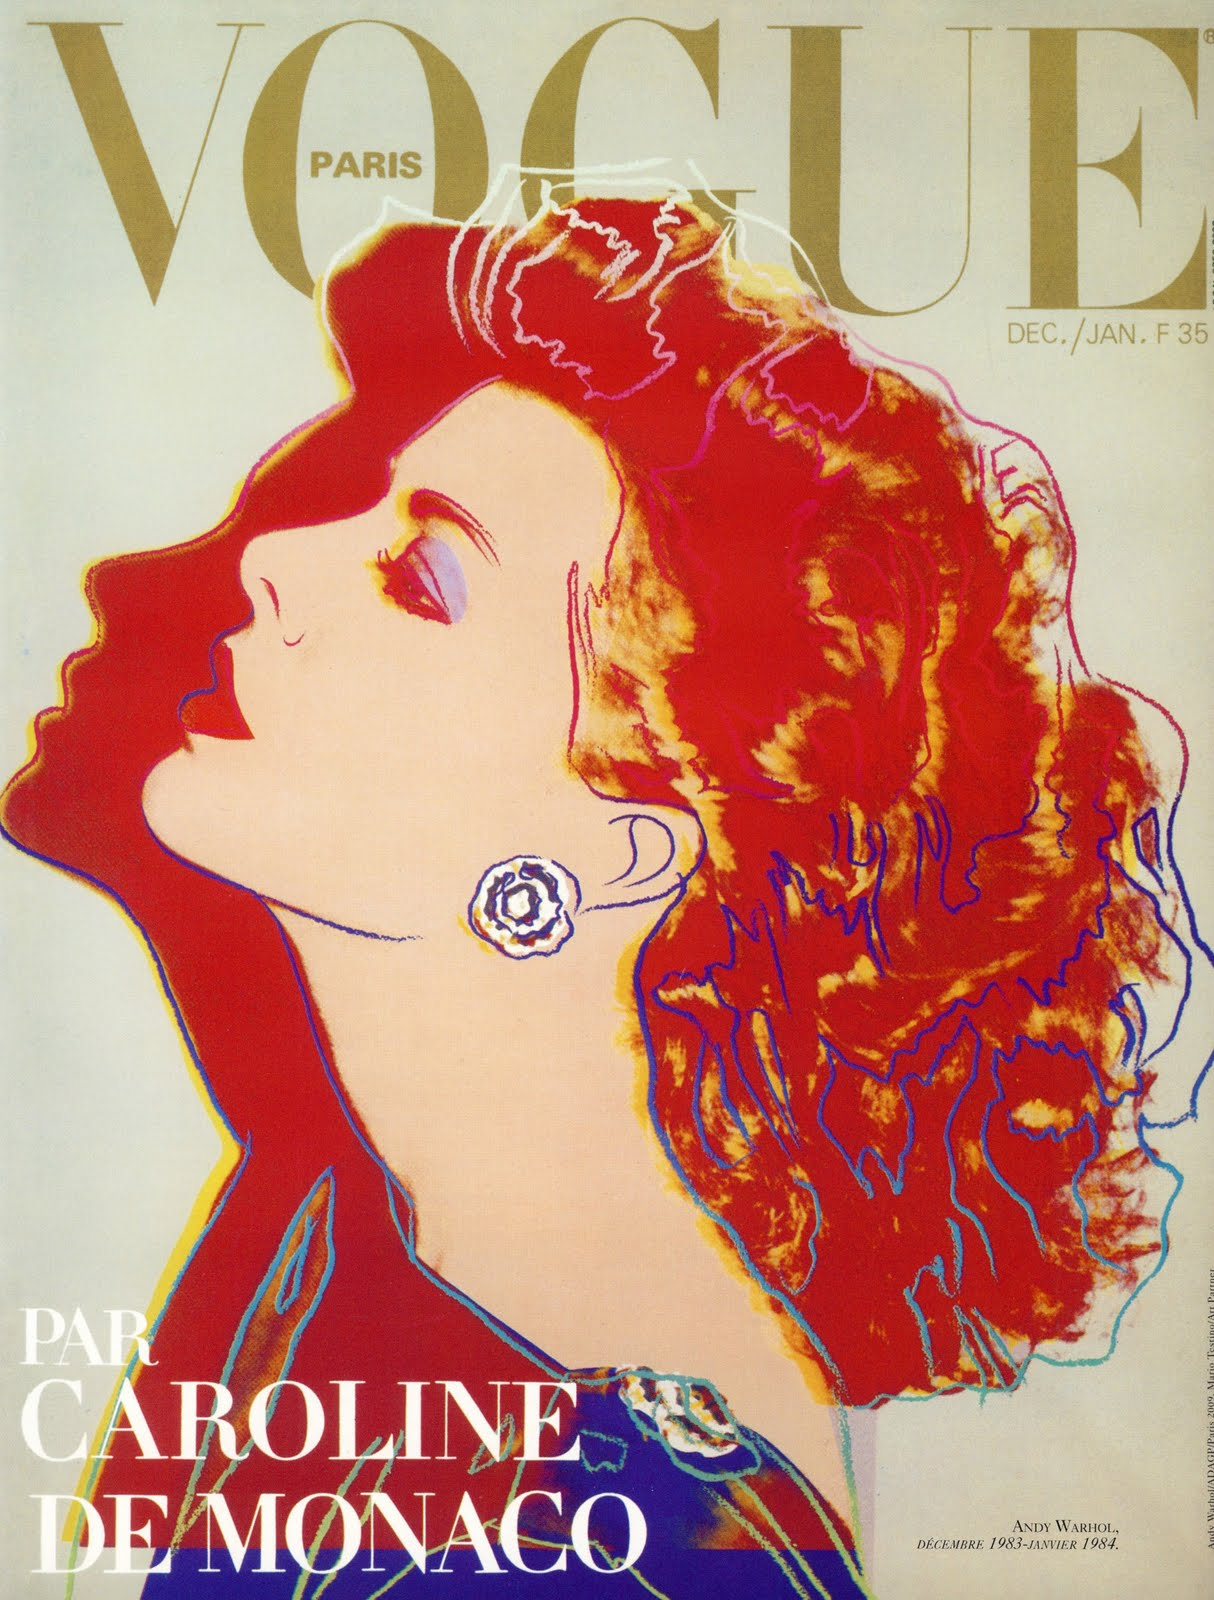 0000 vogue-paris-andy-warhol.jpg